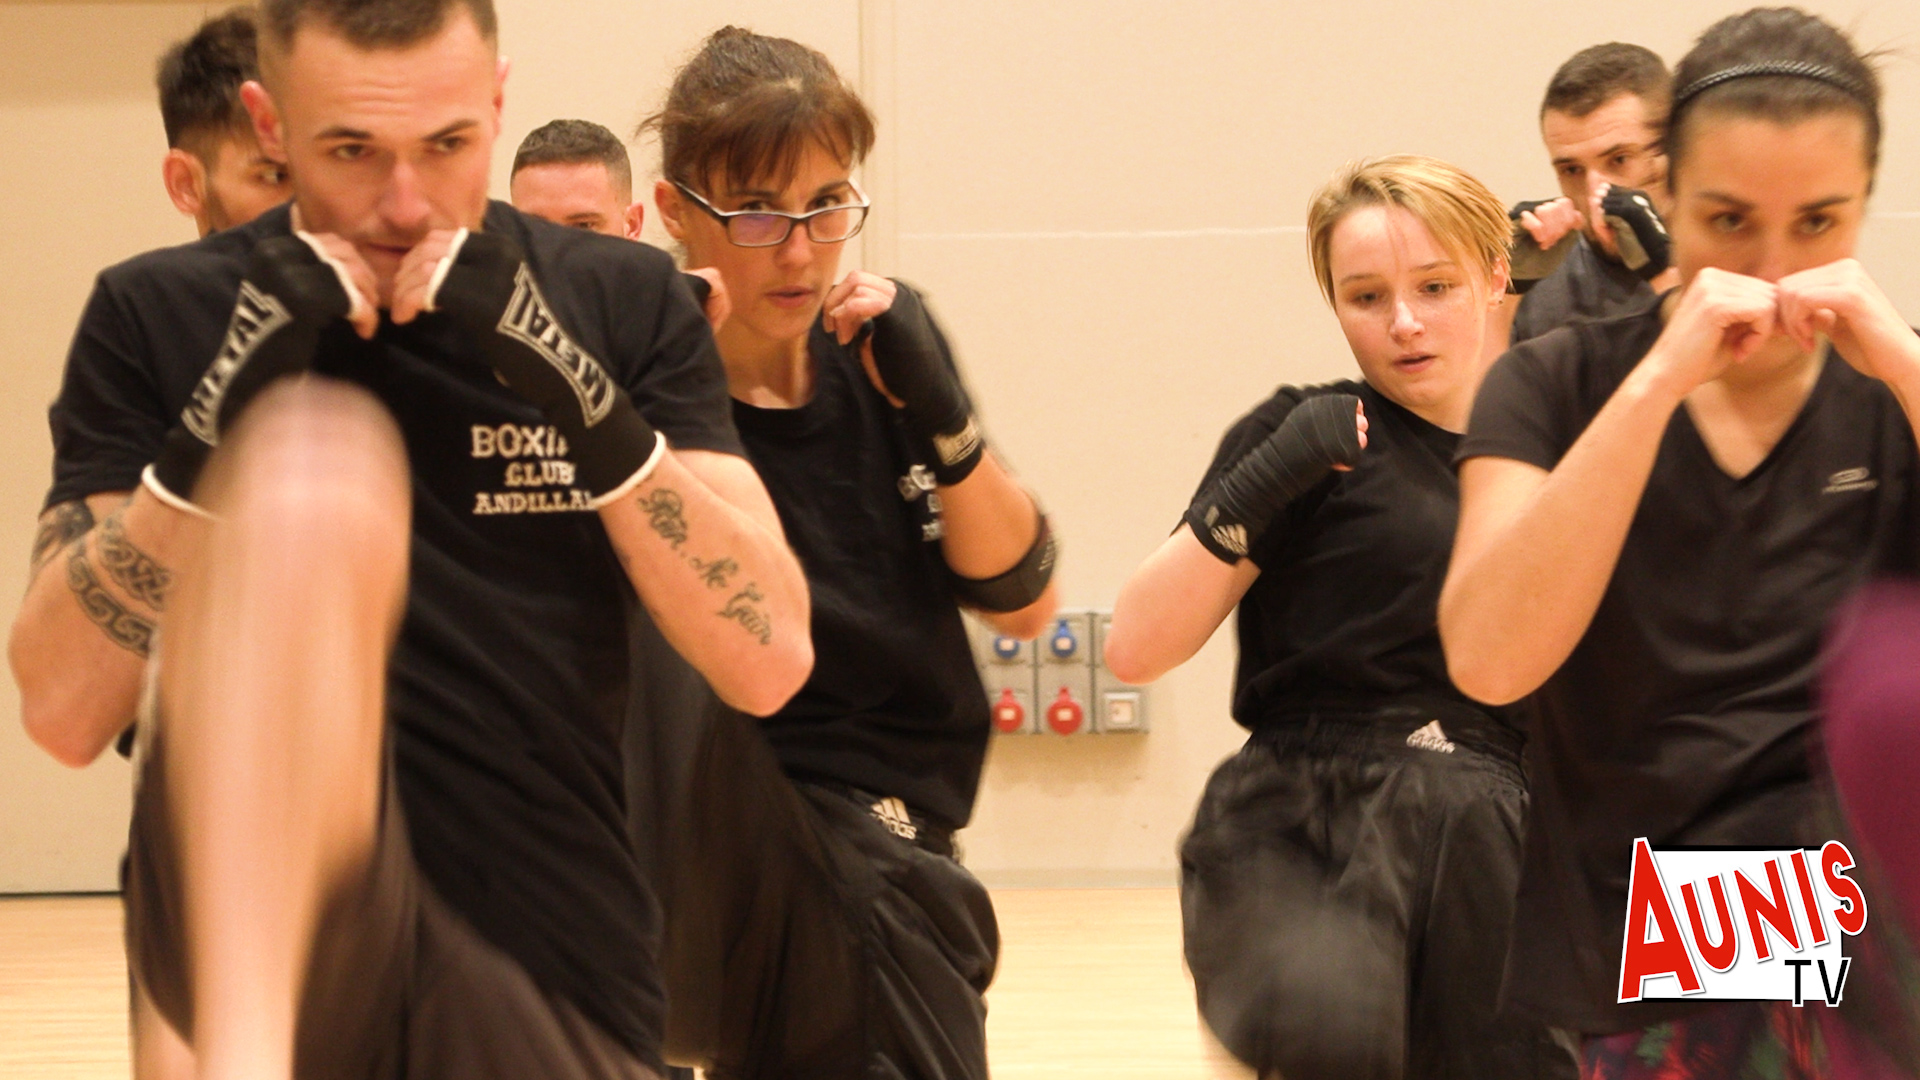 Boxing Club Andillais Open de Paris Full Contact